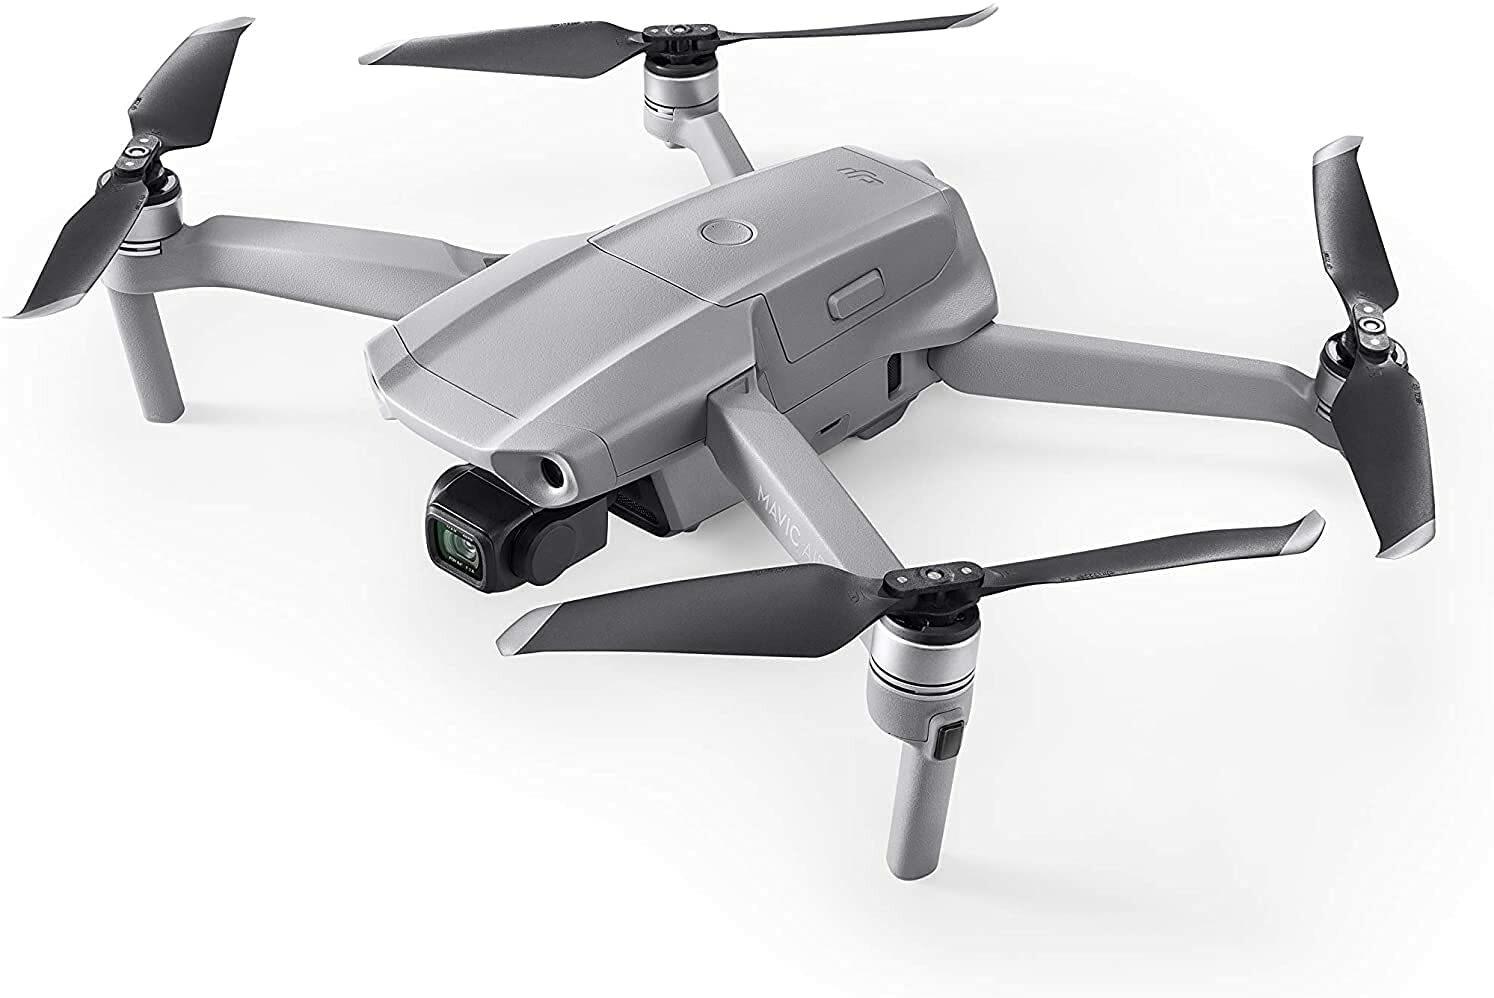 modele rc drony pro